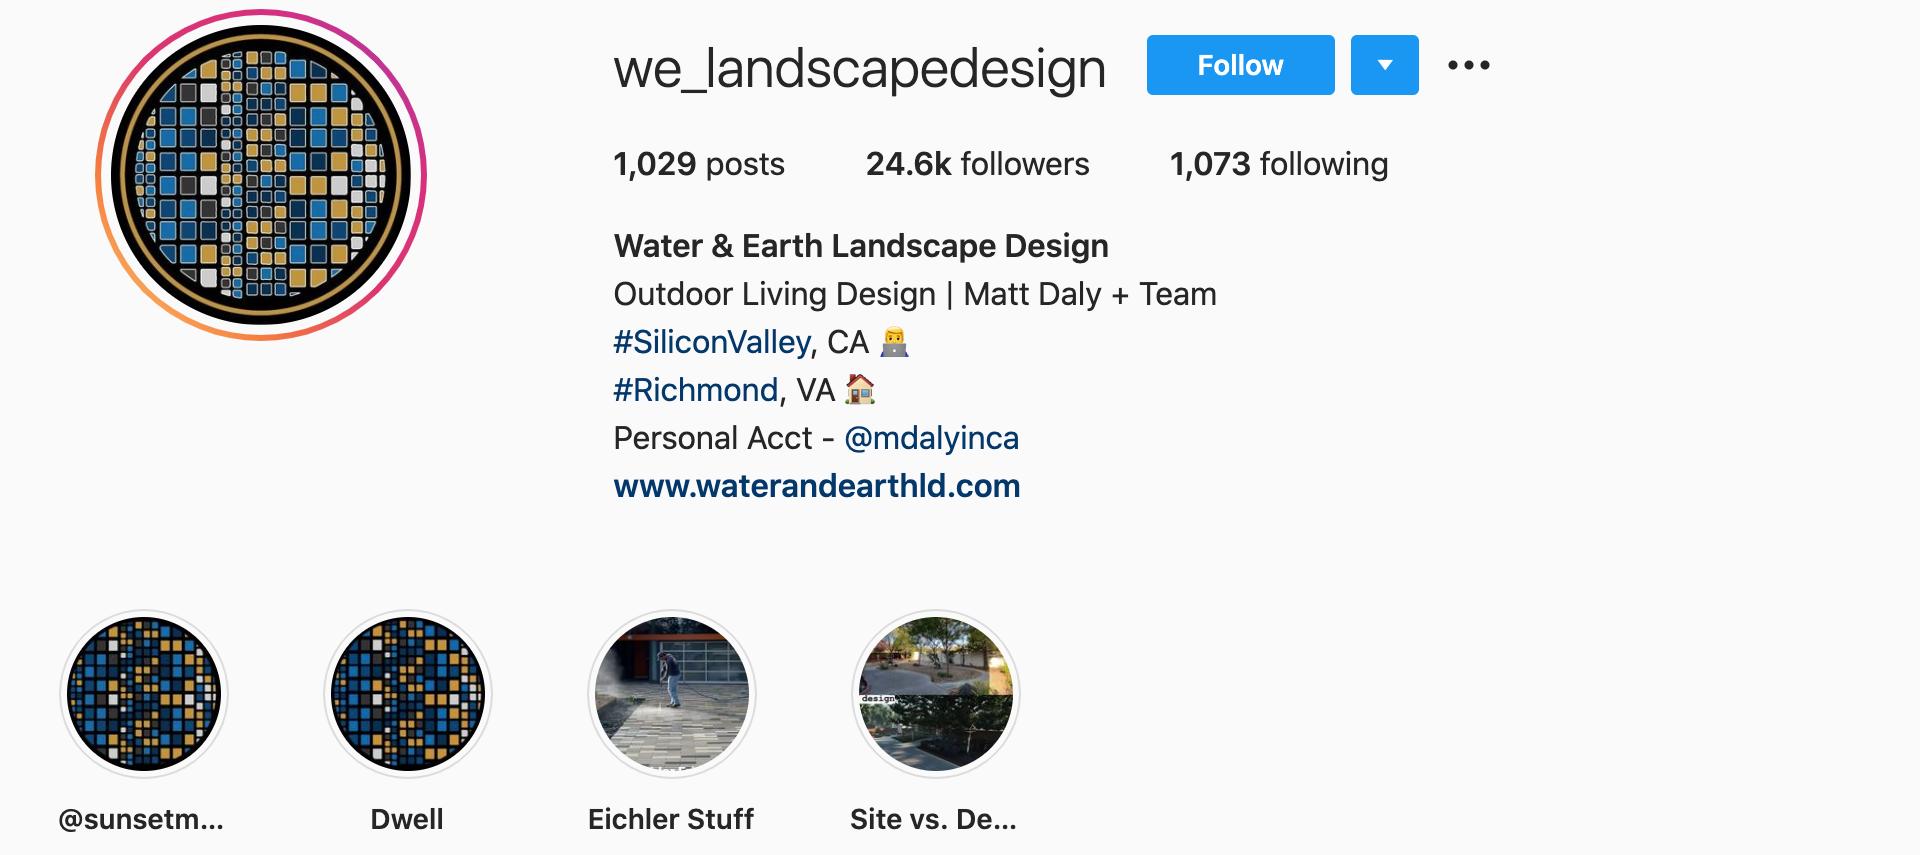 water-&-earth-landscape-design-instagram-profile